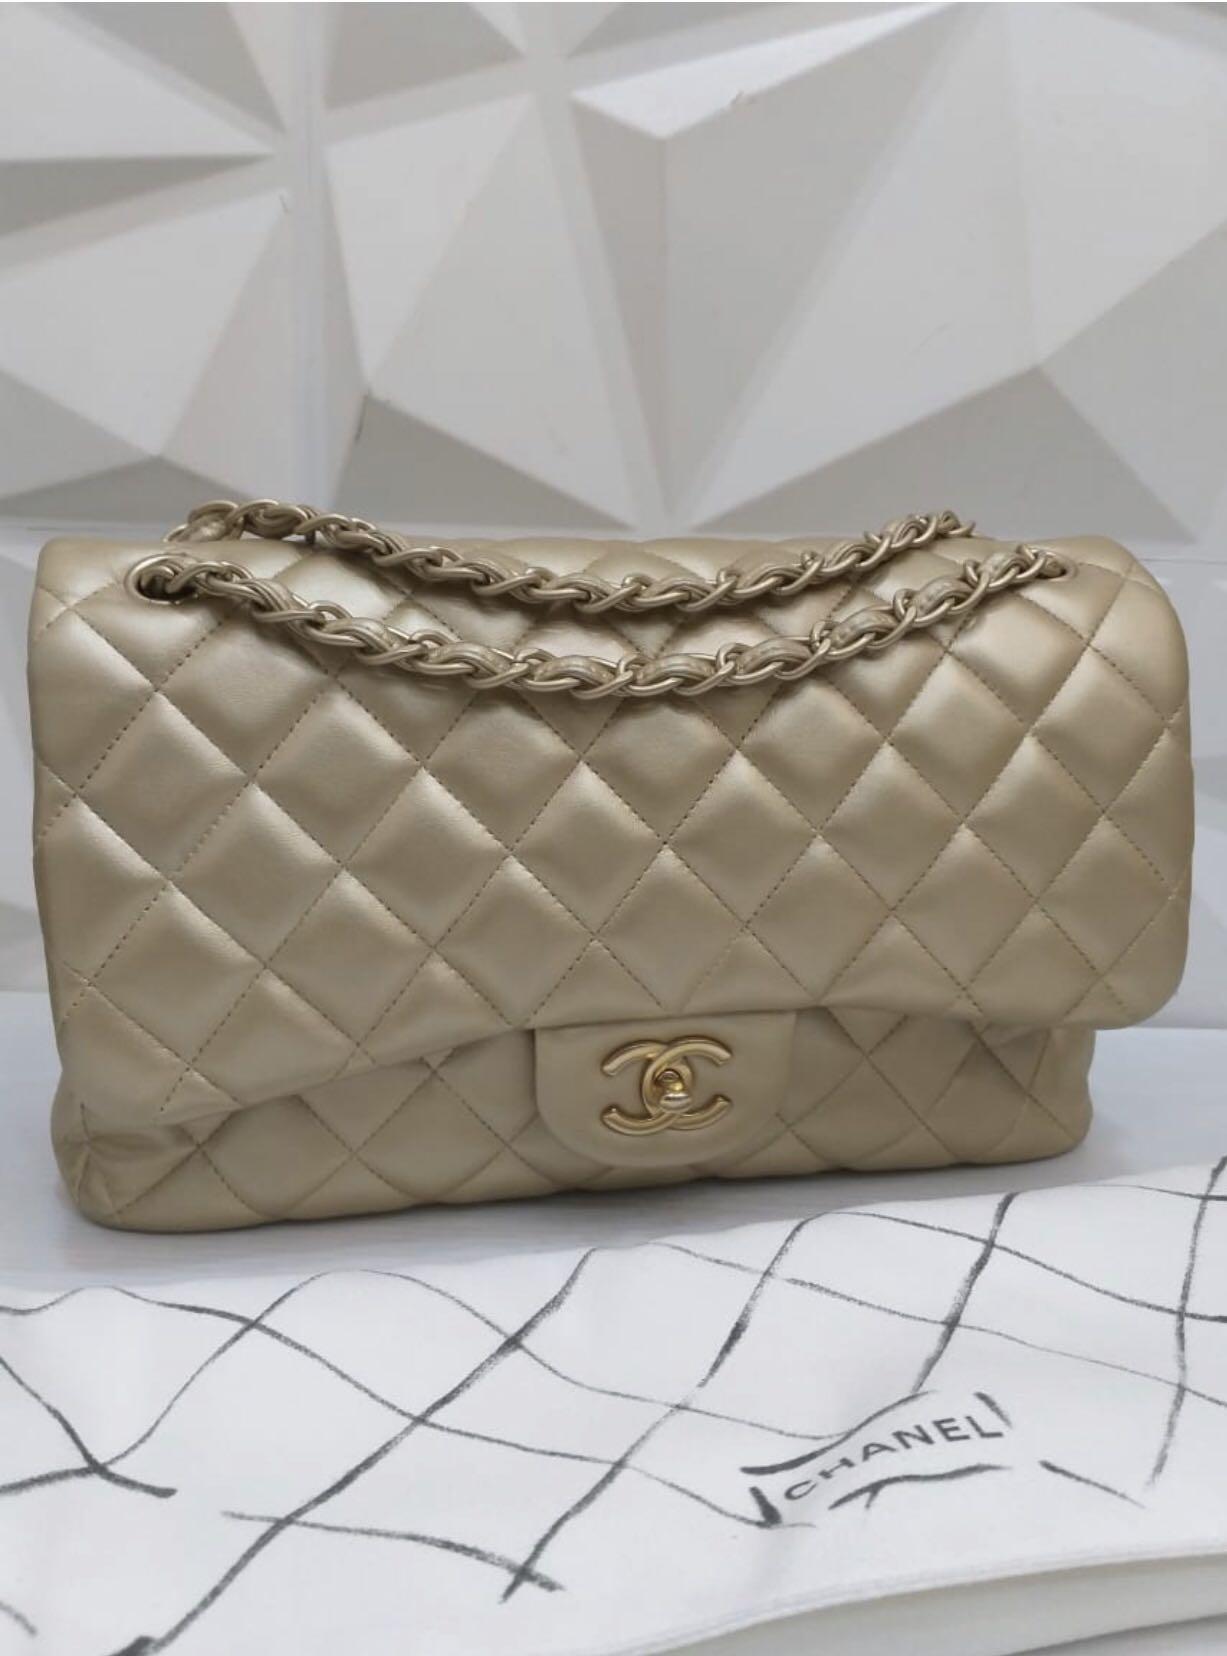 Chanel Bag Jumbo Champagne